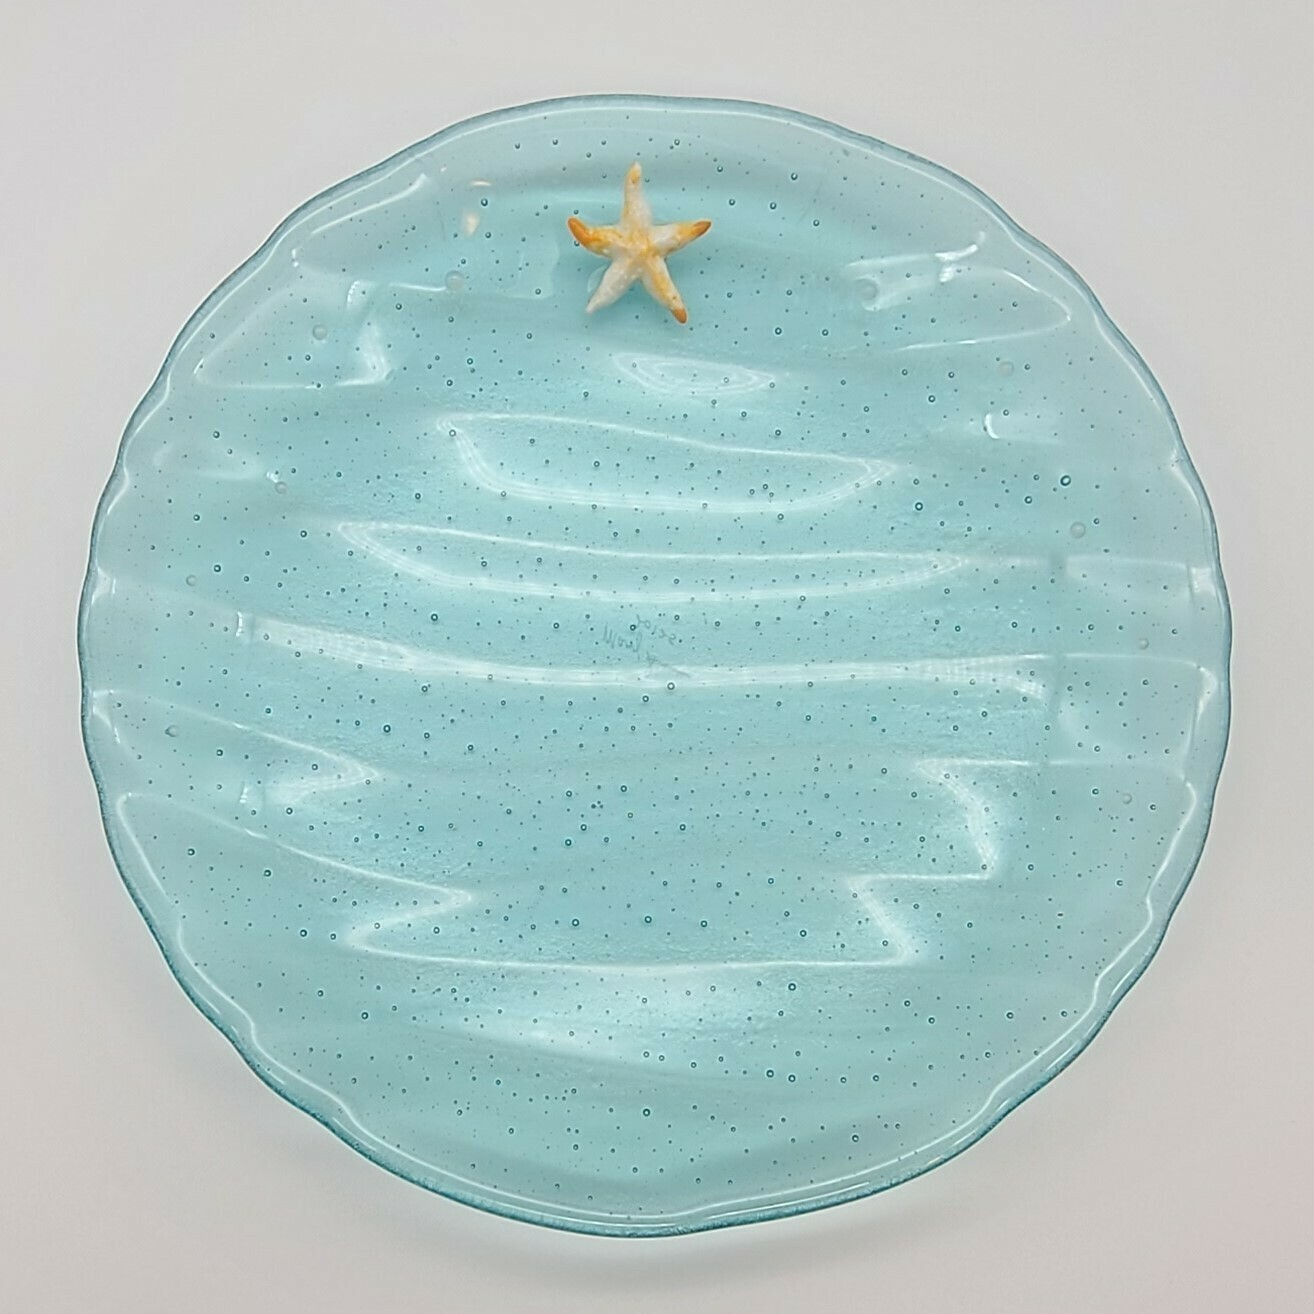 Aqua Bowl with Waves and Starfish